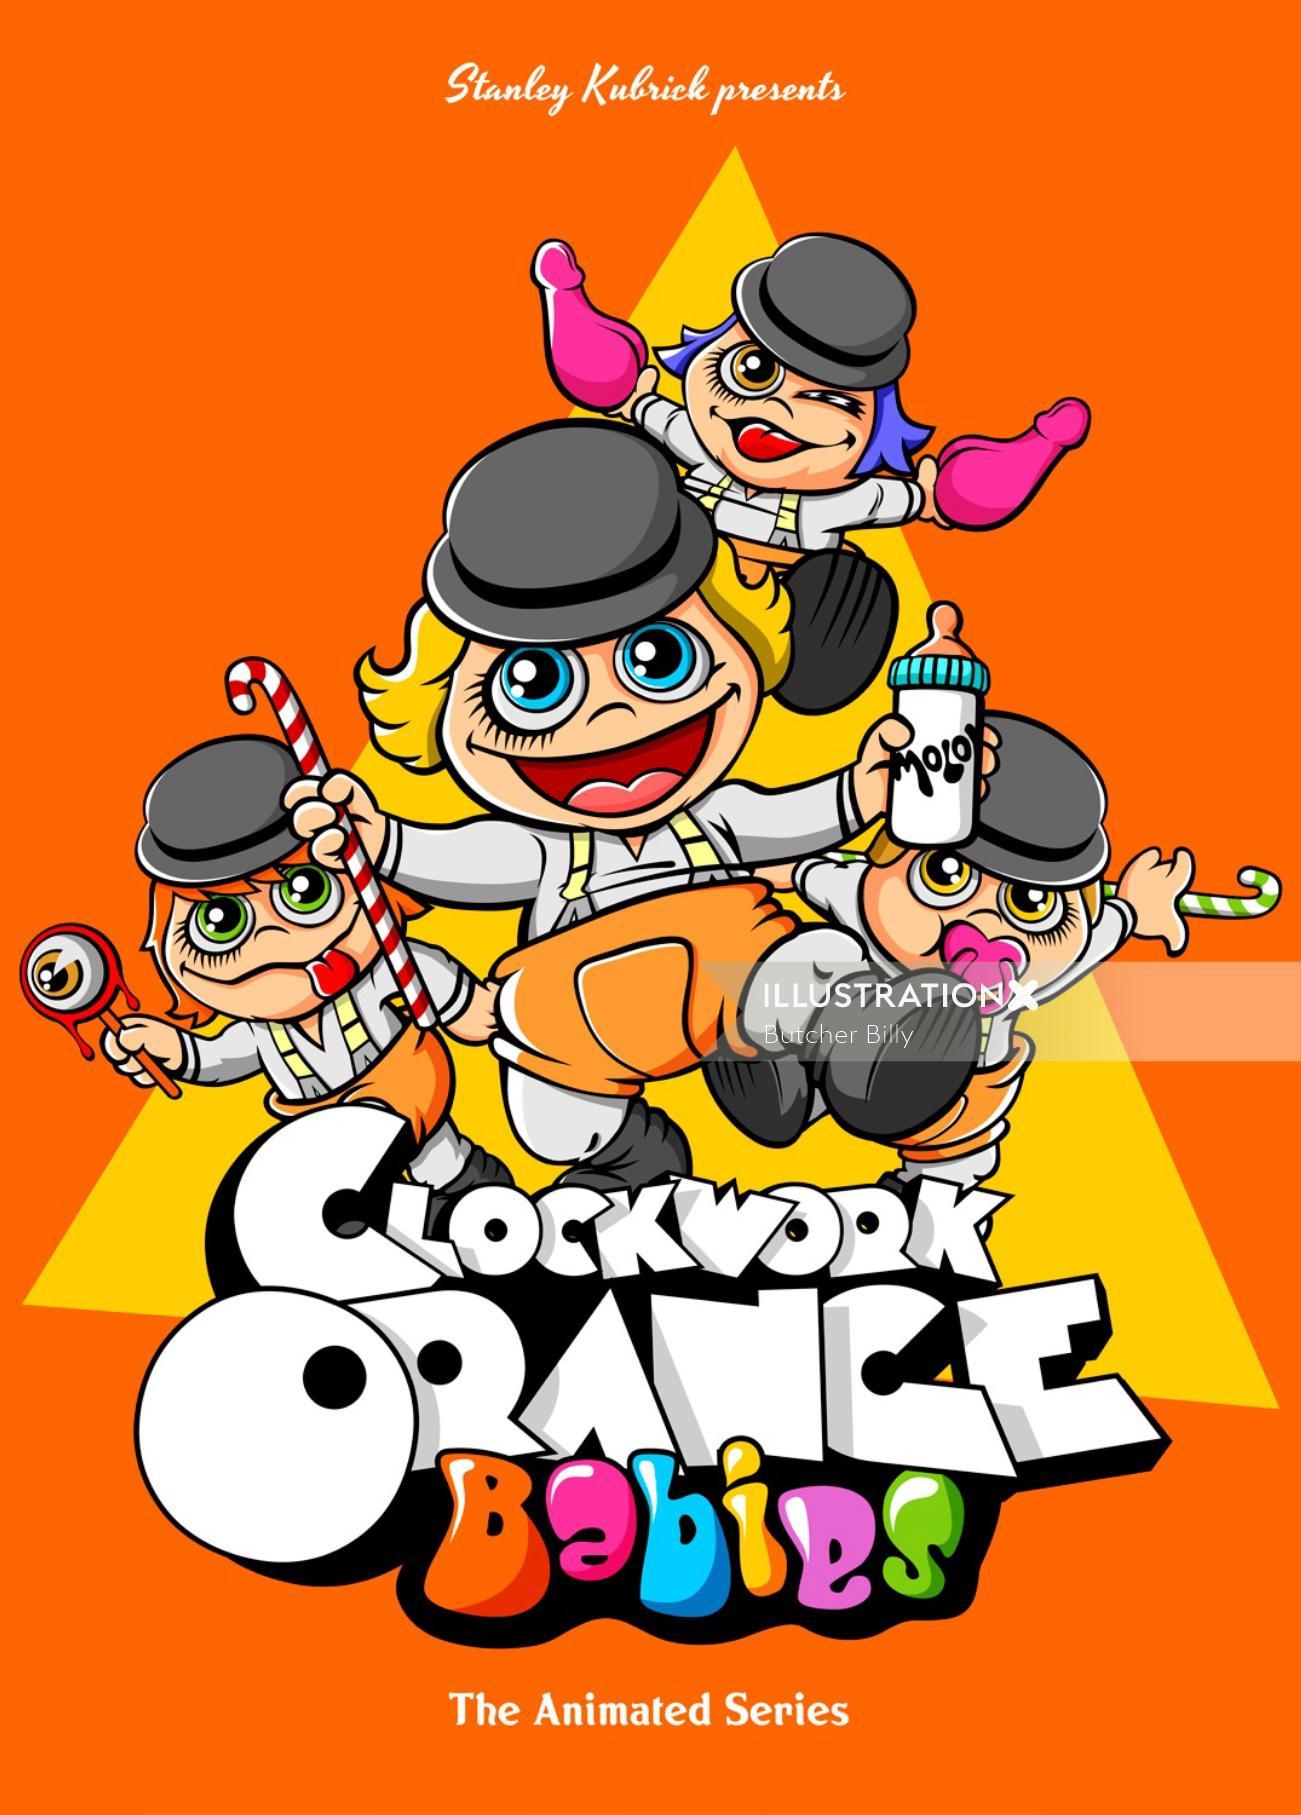 Clockwork Orange Babies Design by Butcher Billy